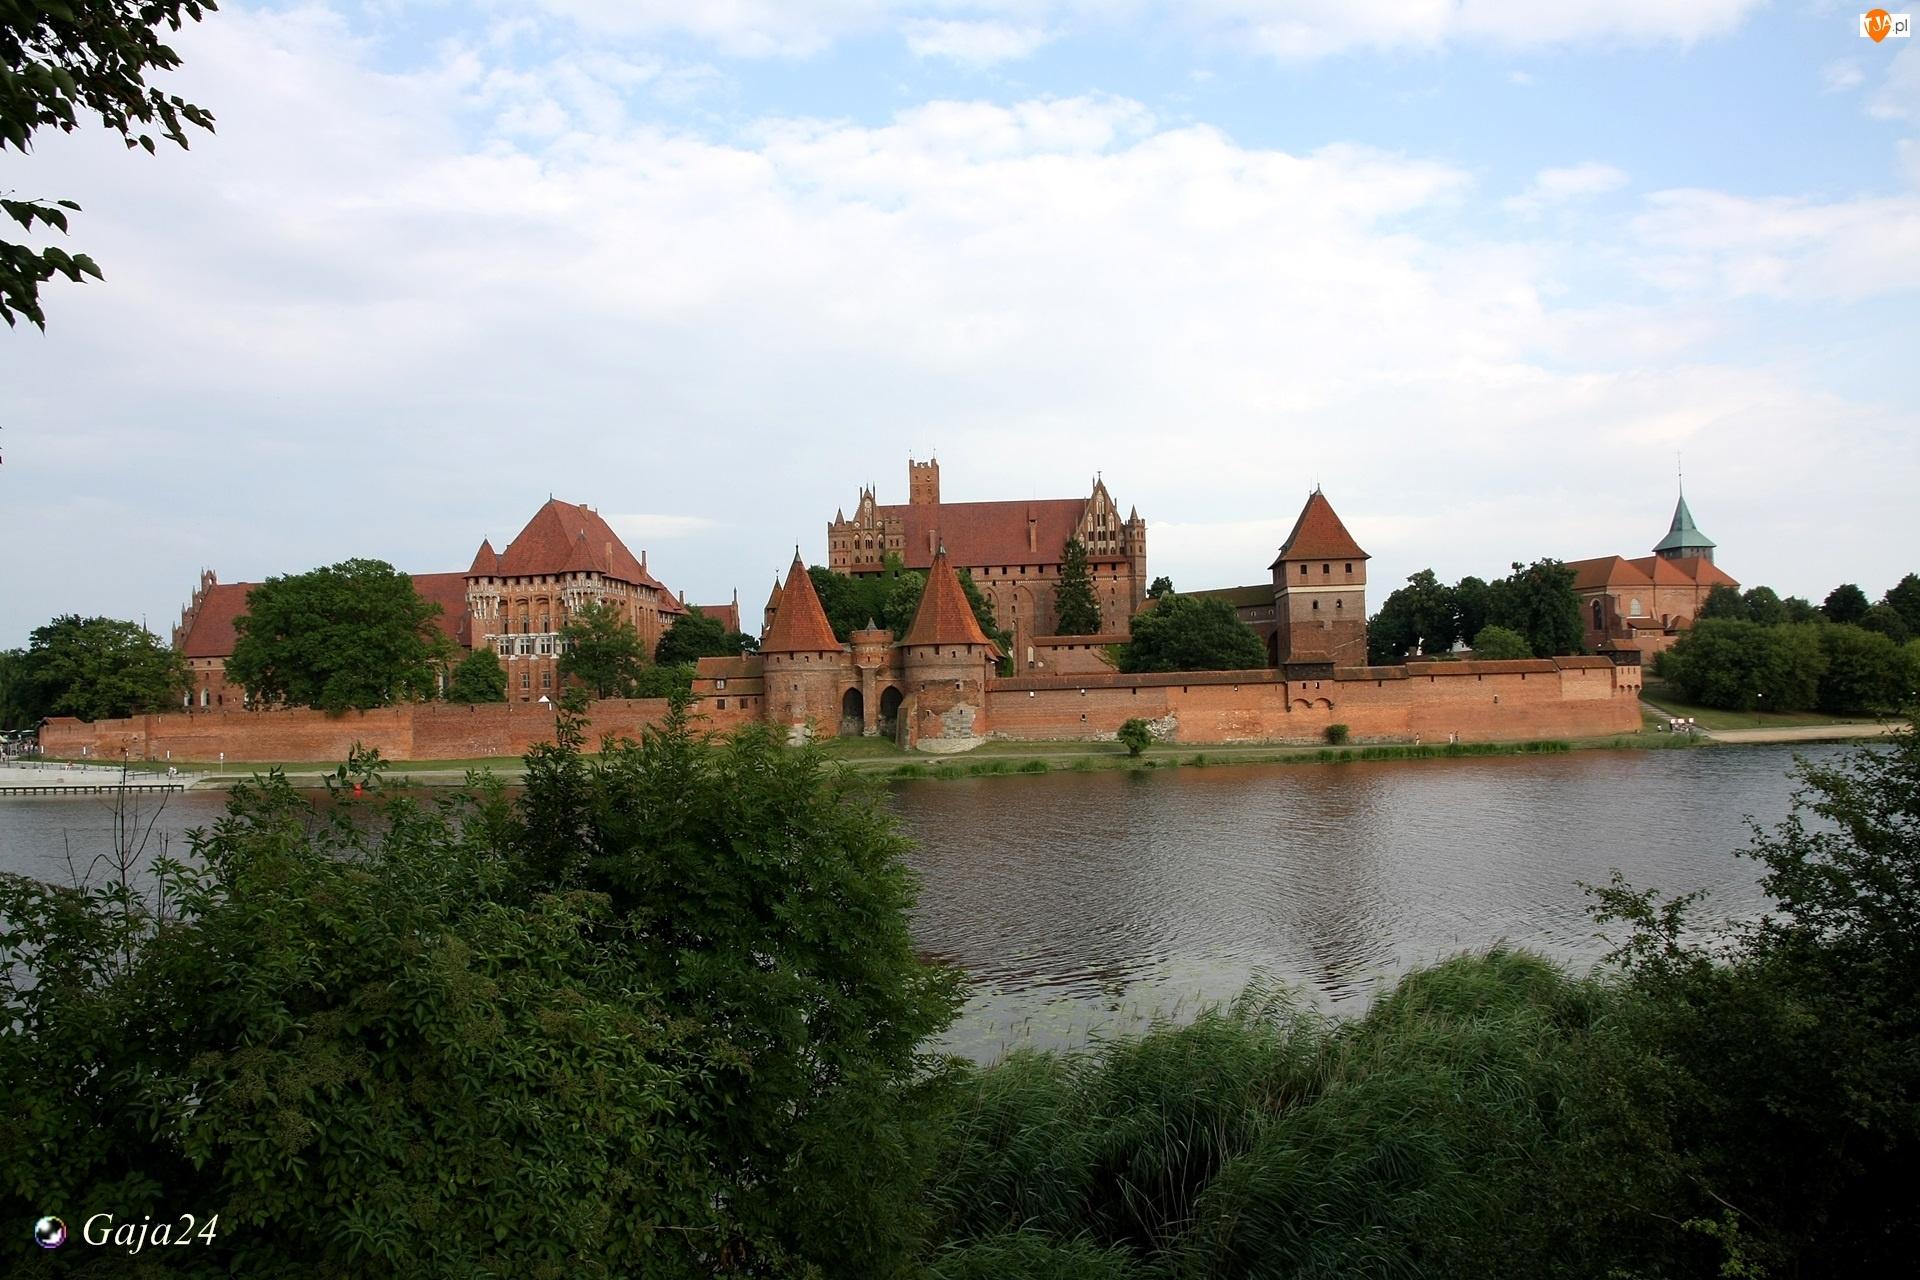 Polska, Zamek Krzyżacki, Malbork